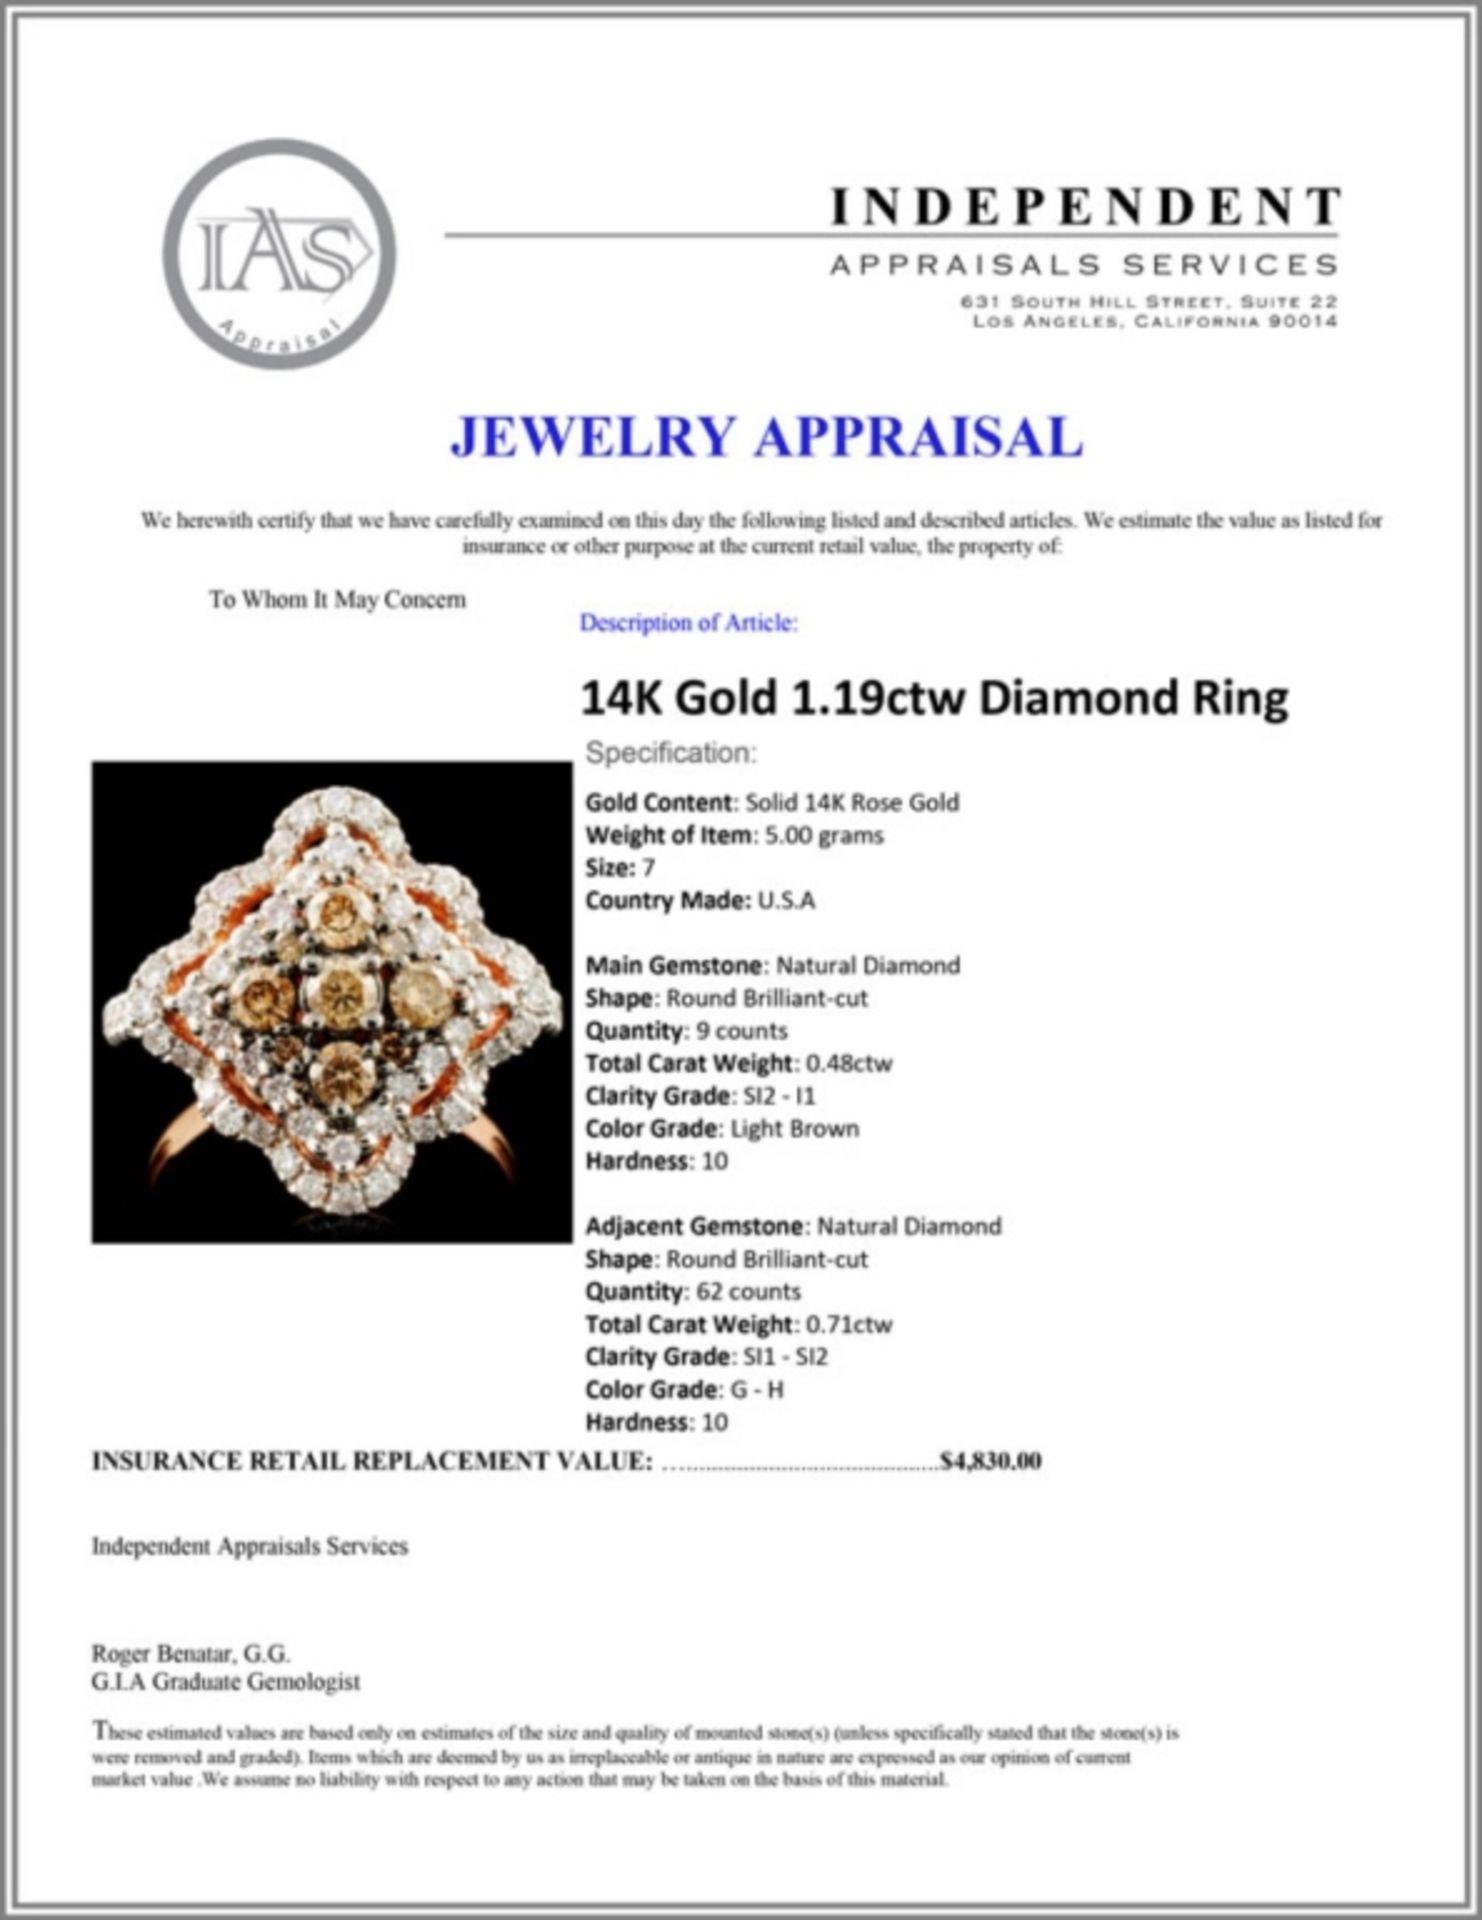 14K Gold 1.19ctw Diamond Ring - Image 5 of 5